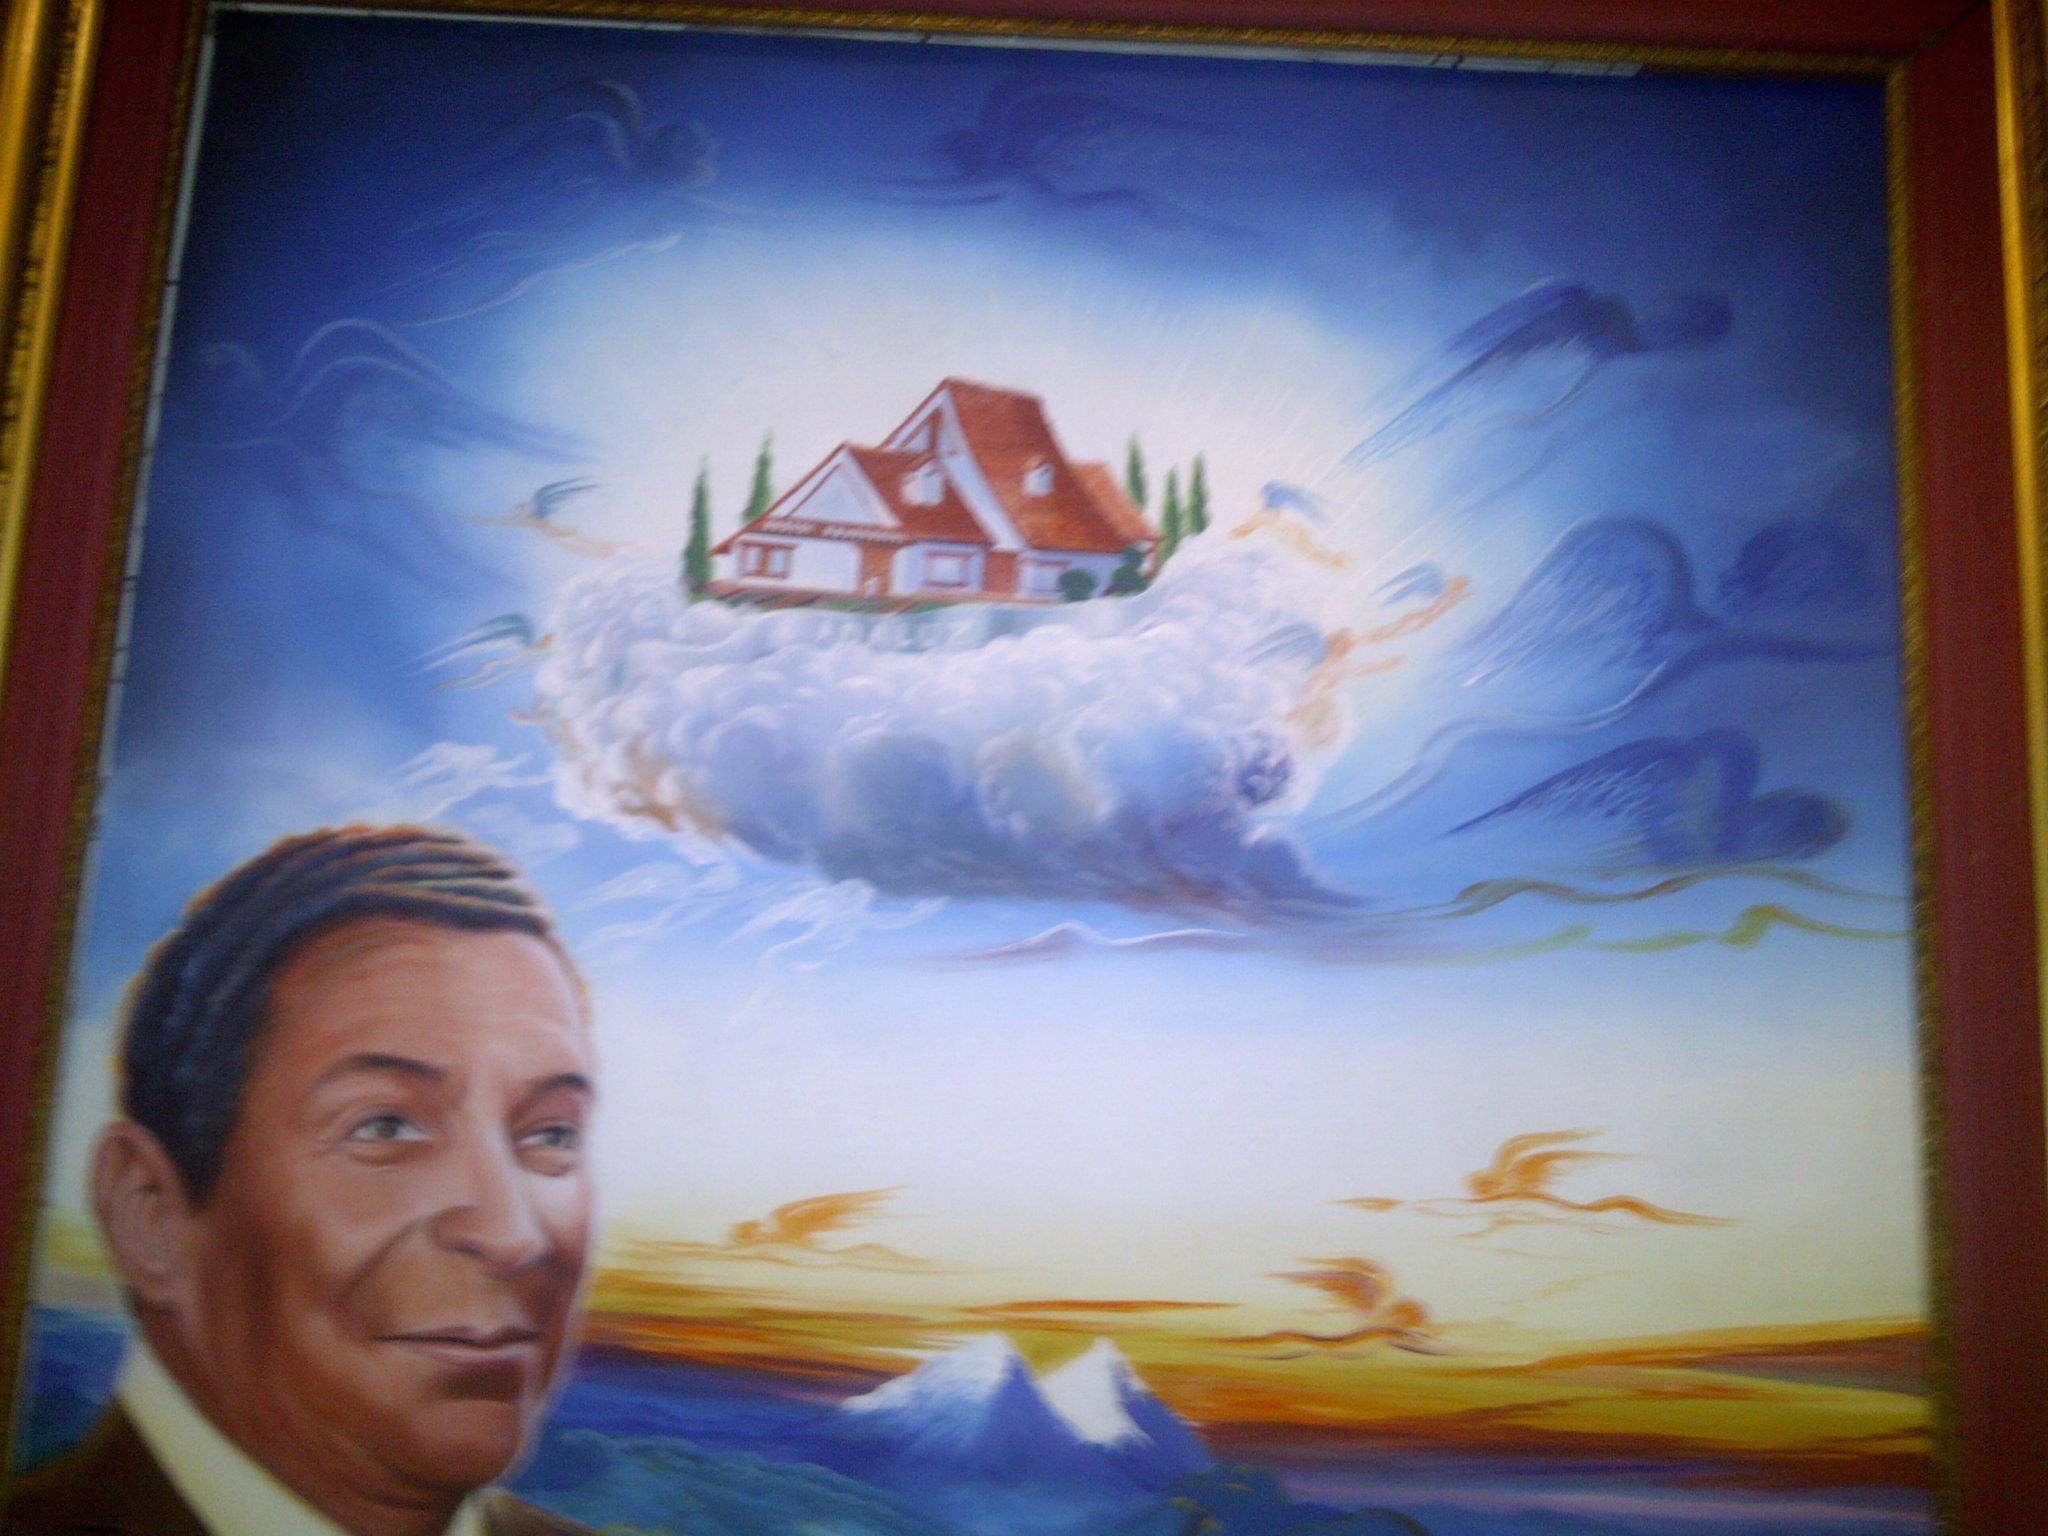 85e anniversaire de la naissance de rafael escalona